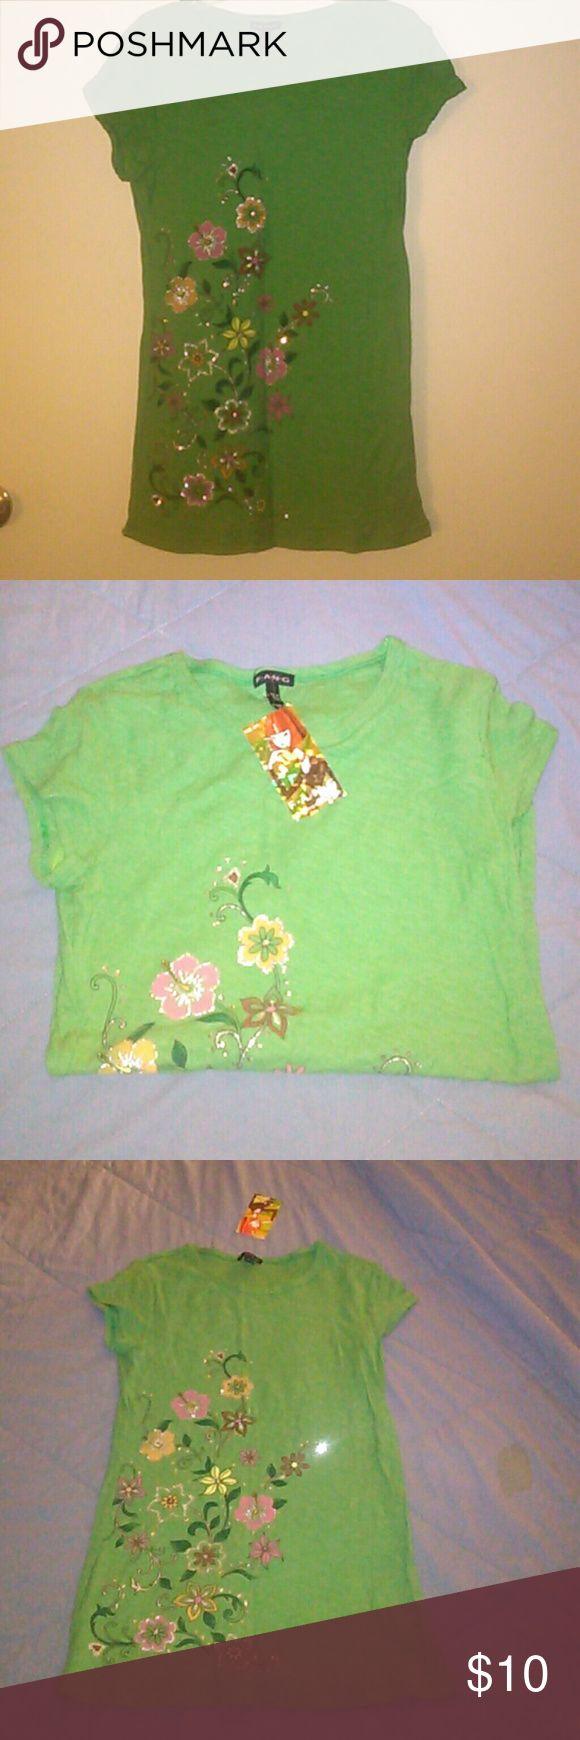 Women's green floral tee Women's green floral tee Tops Tees - Short Sleeve